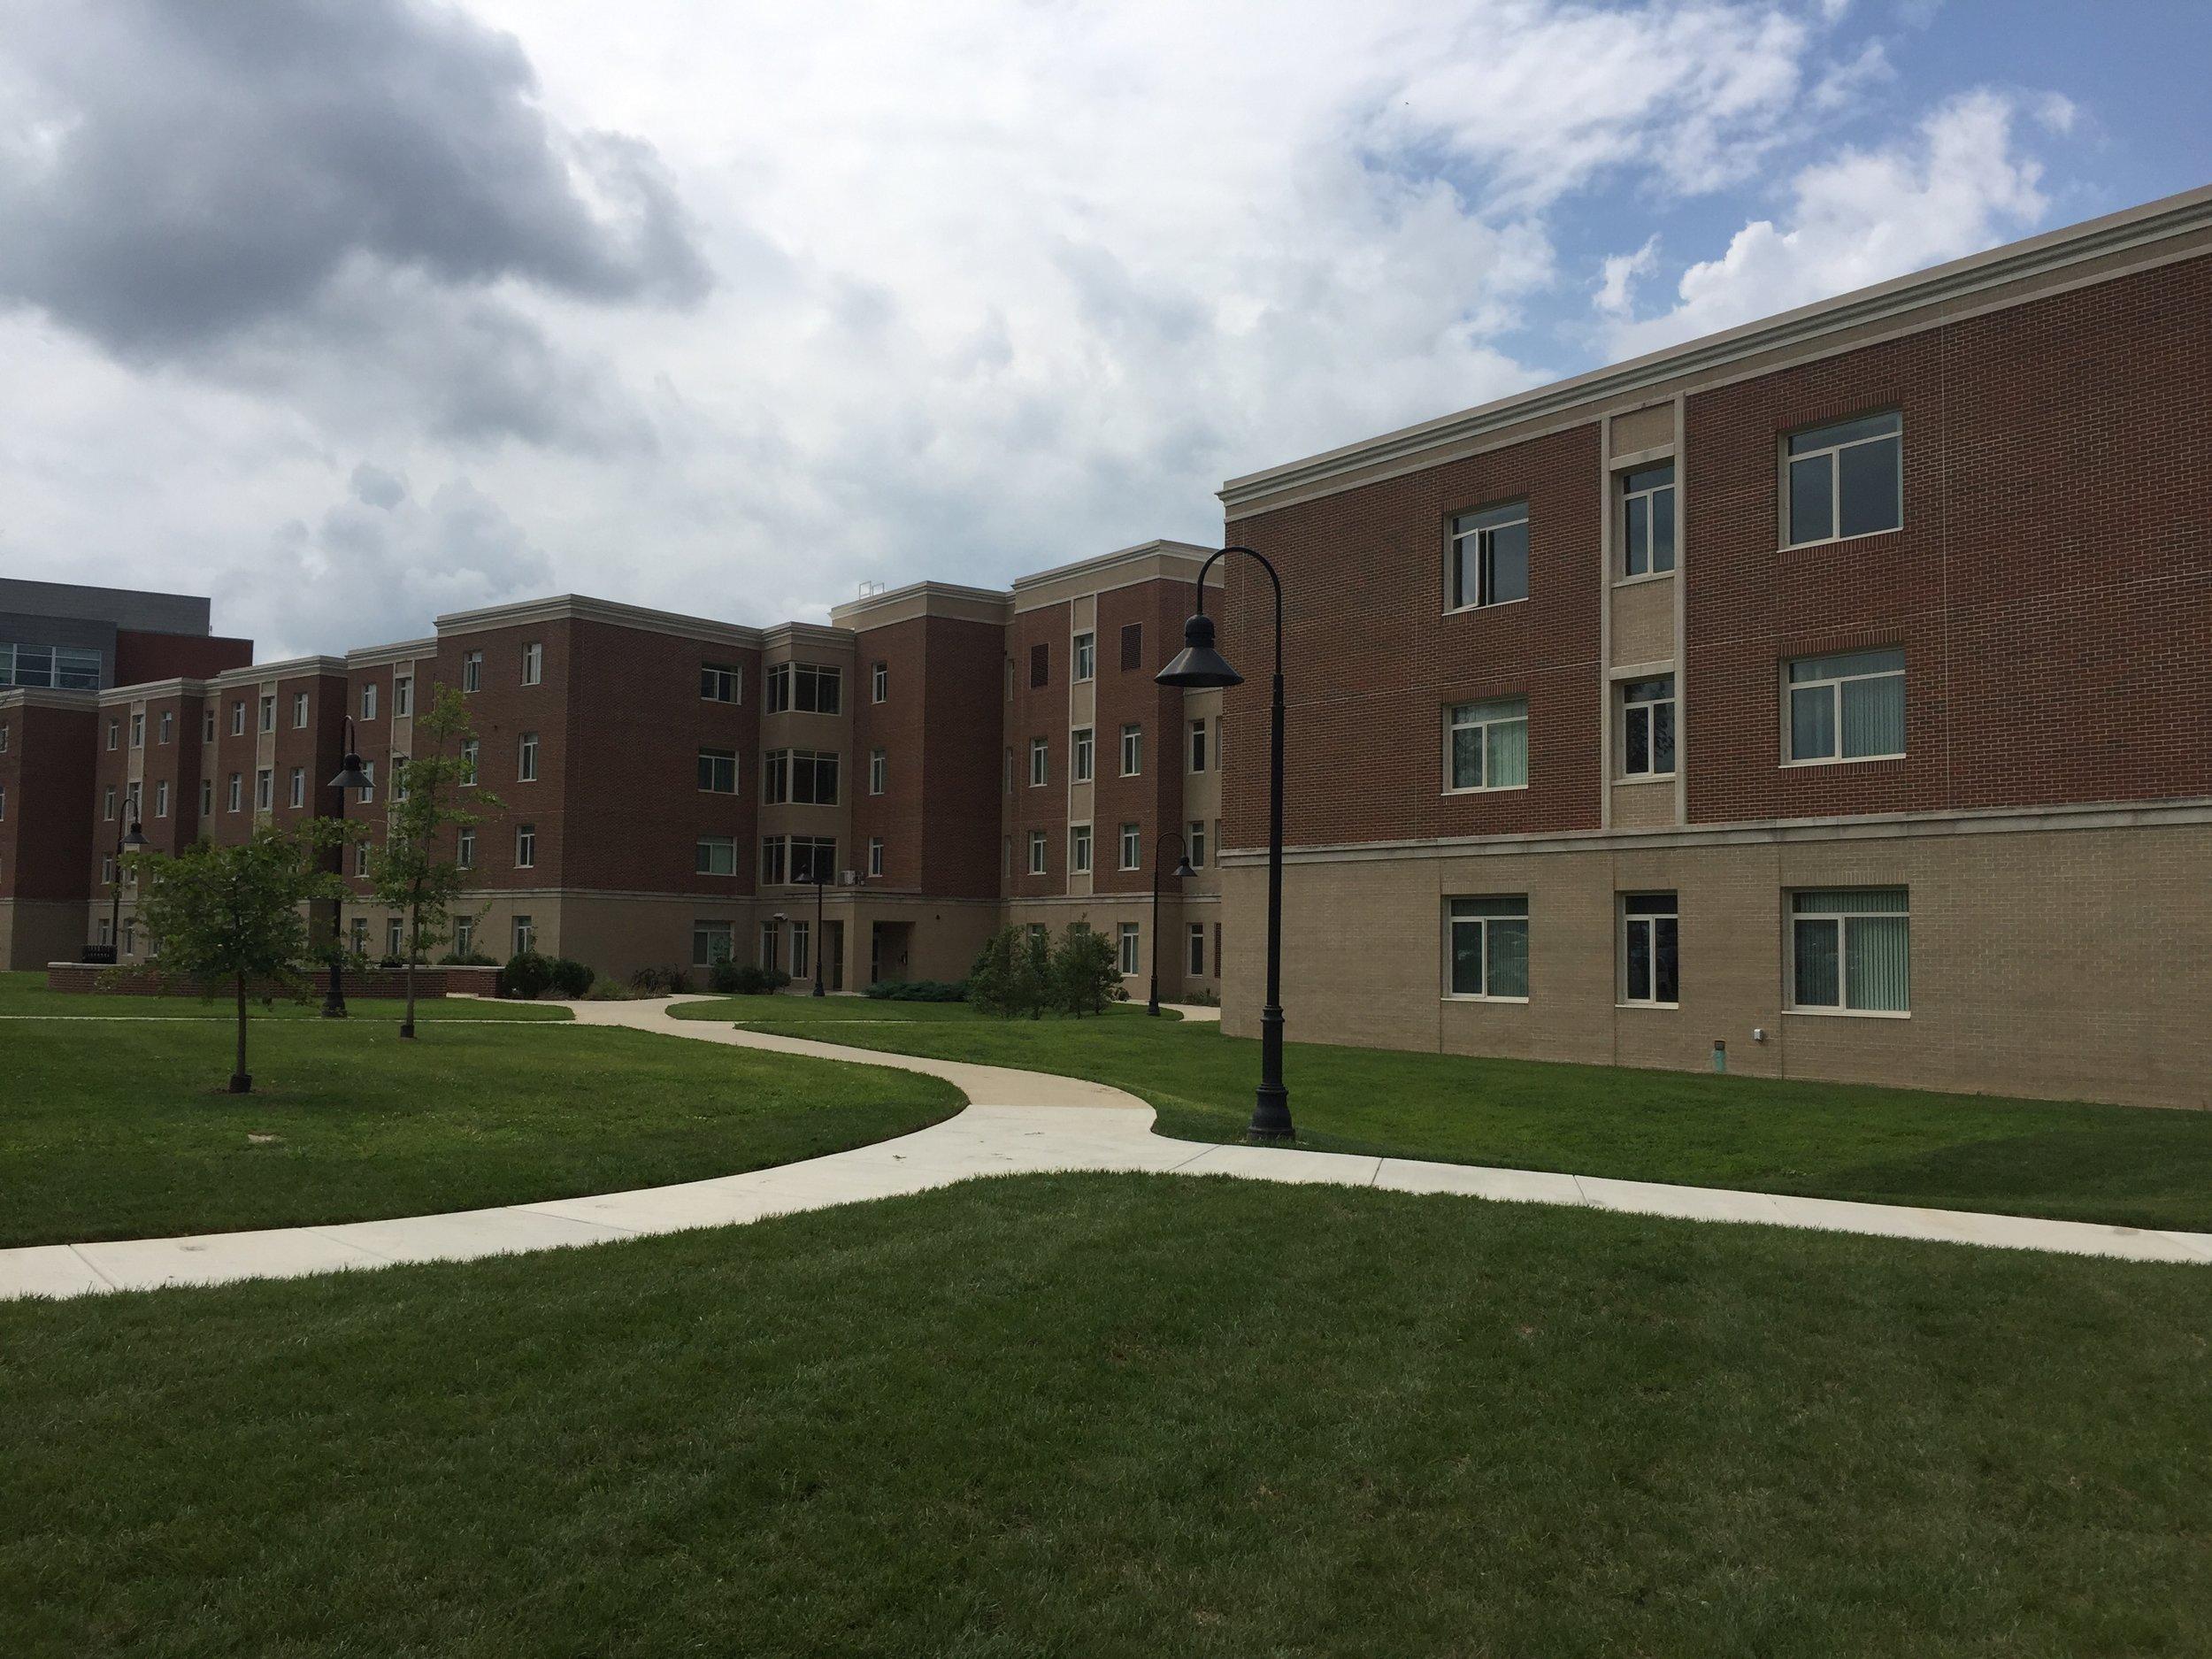 Eastern Kentucky University - New Student Housing